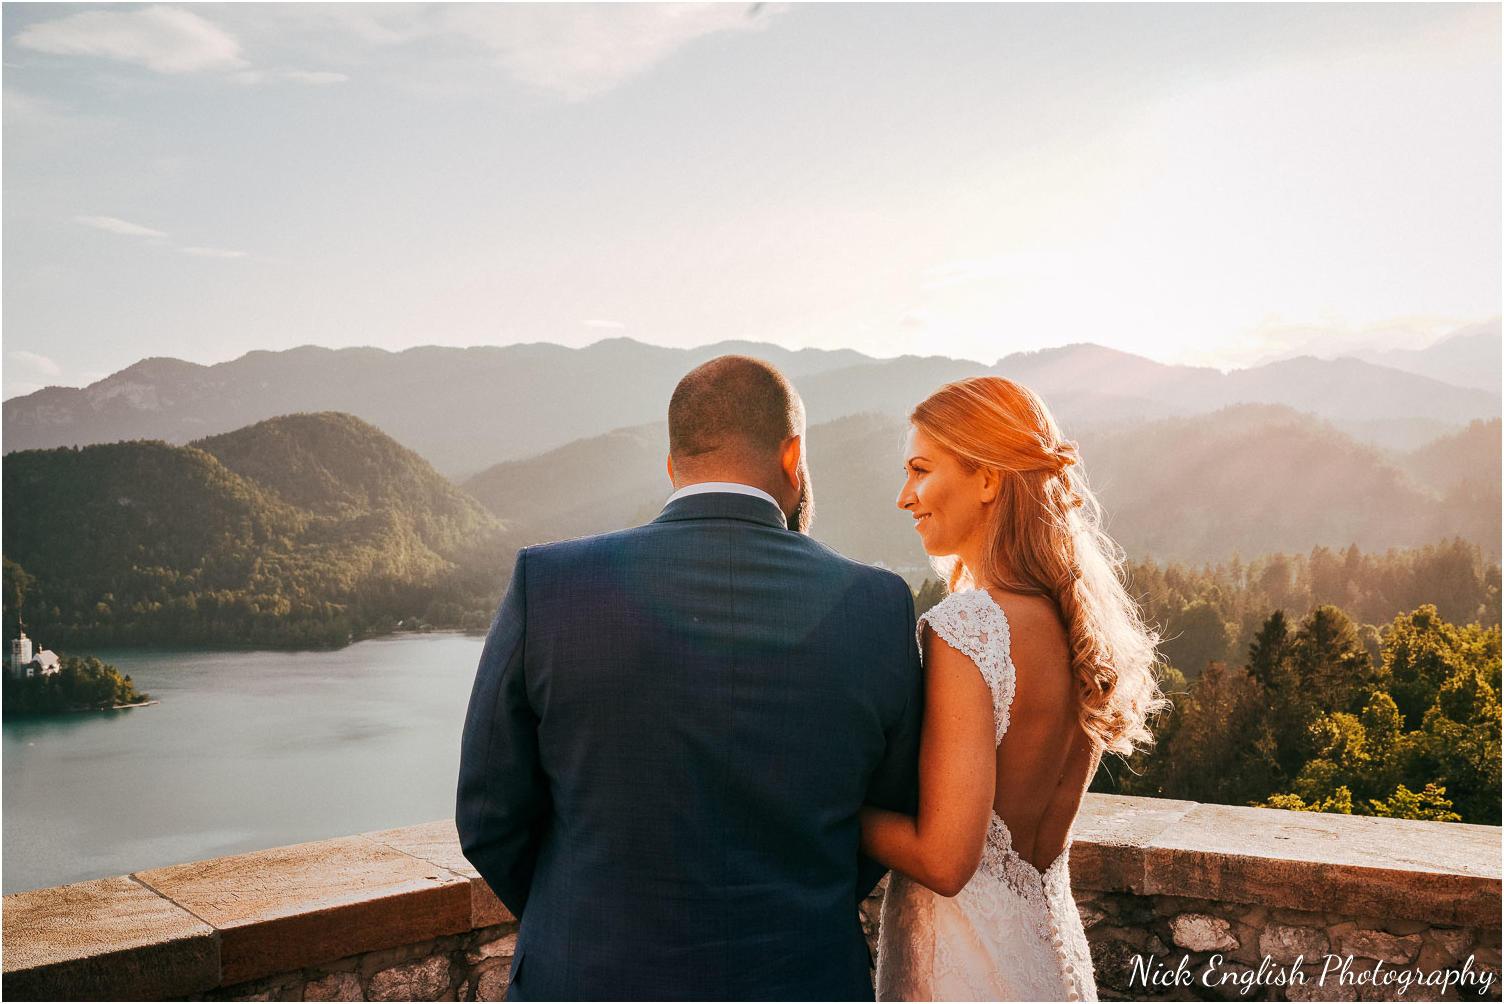 Destination_Wedding_Photographer_Slovenia_Nick_English_Photography-70-32.jpg